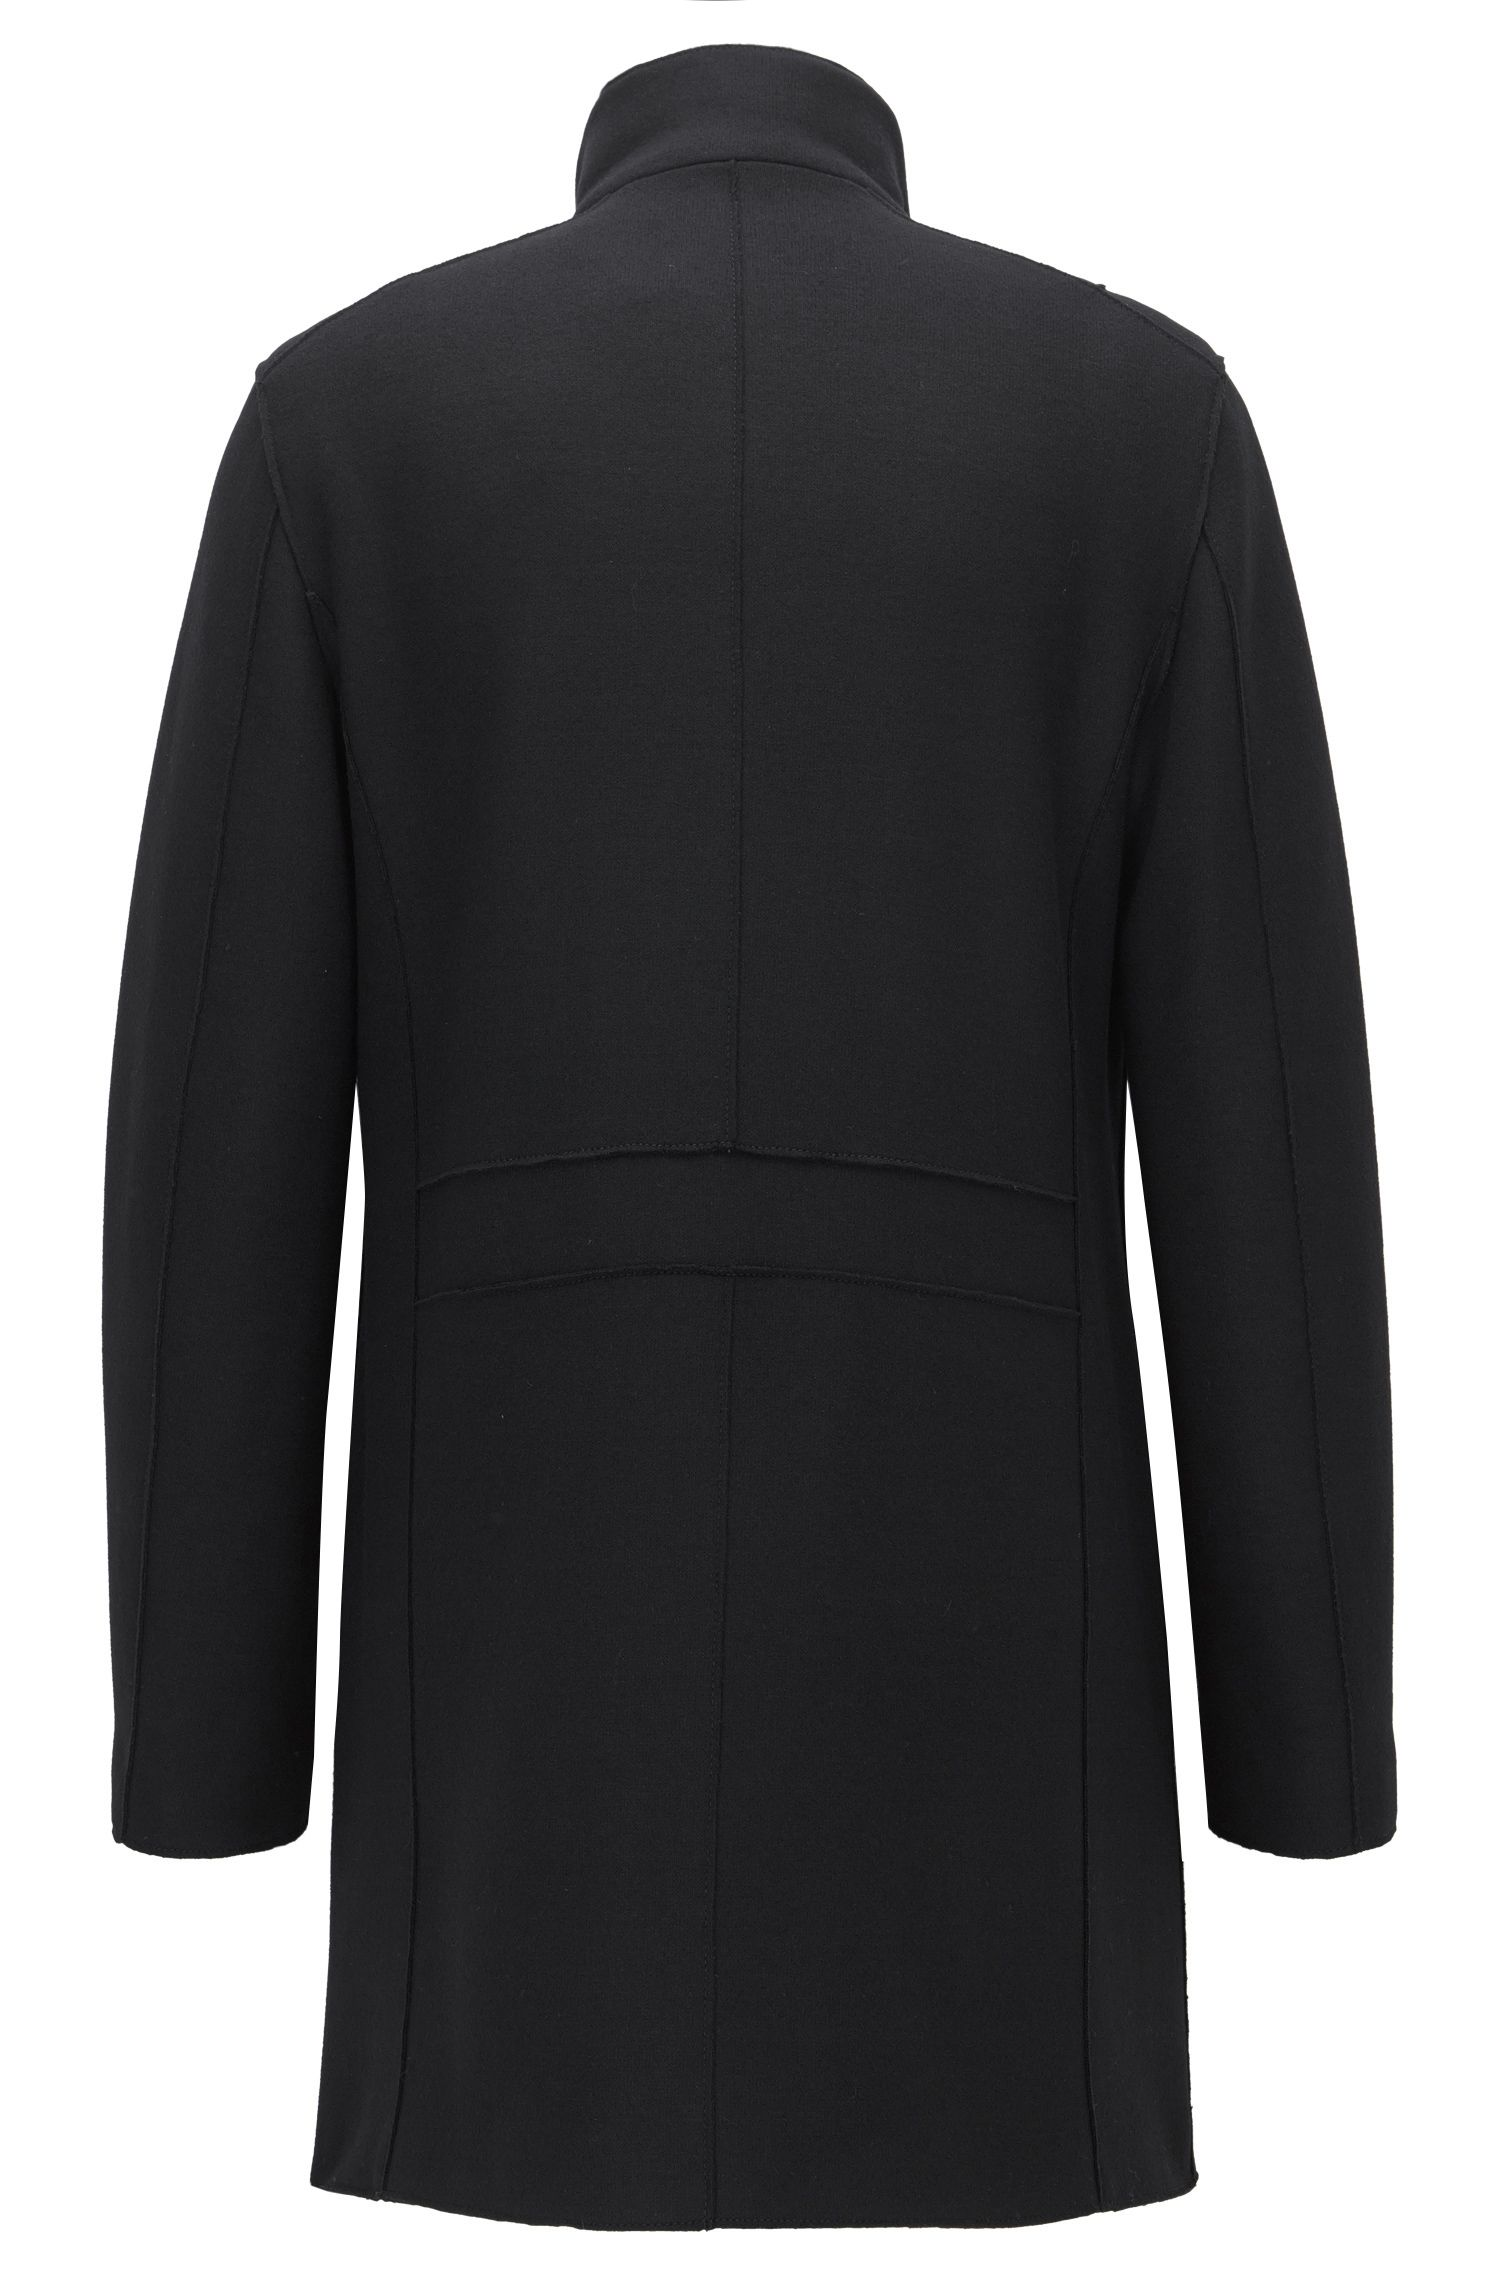 Virgin Wool Cashmere Blend Coat   Minlo